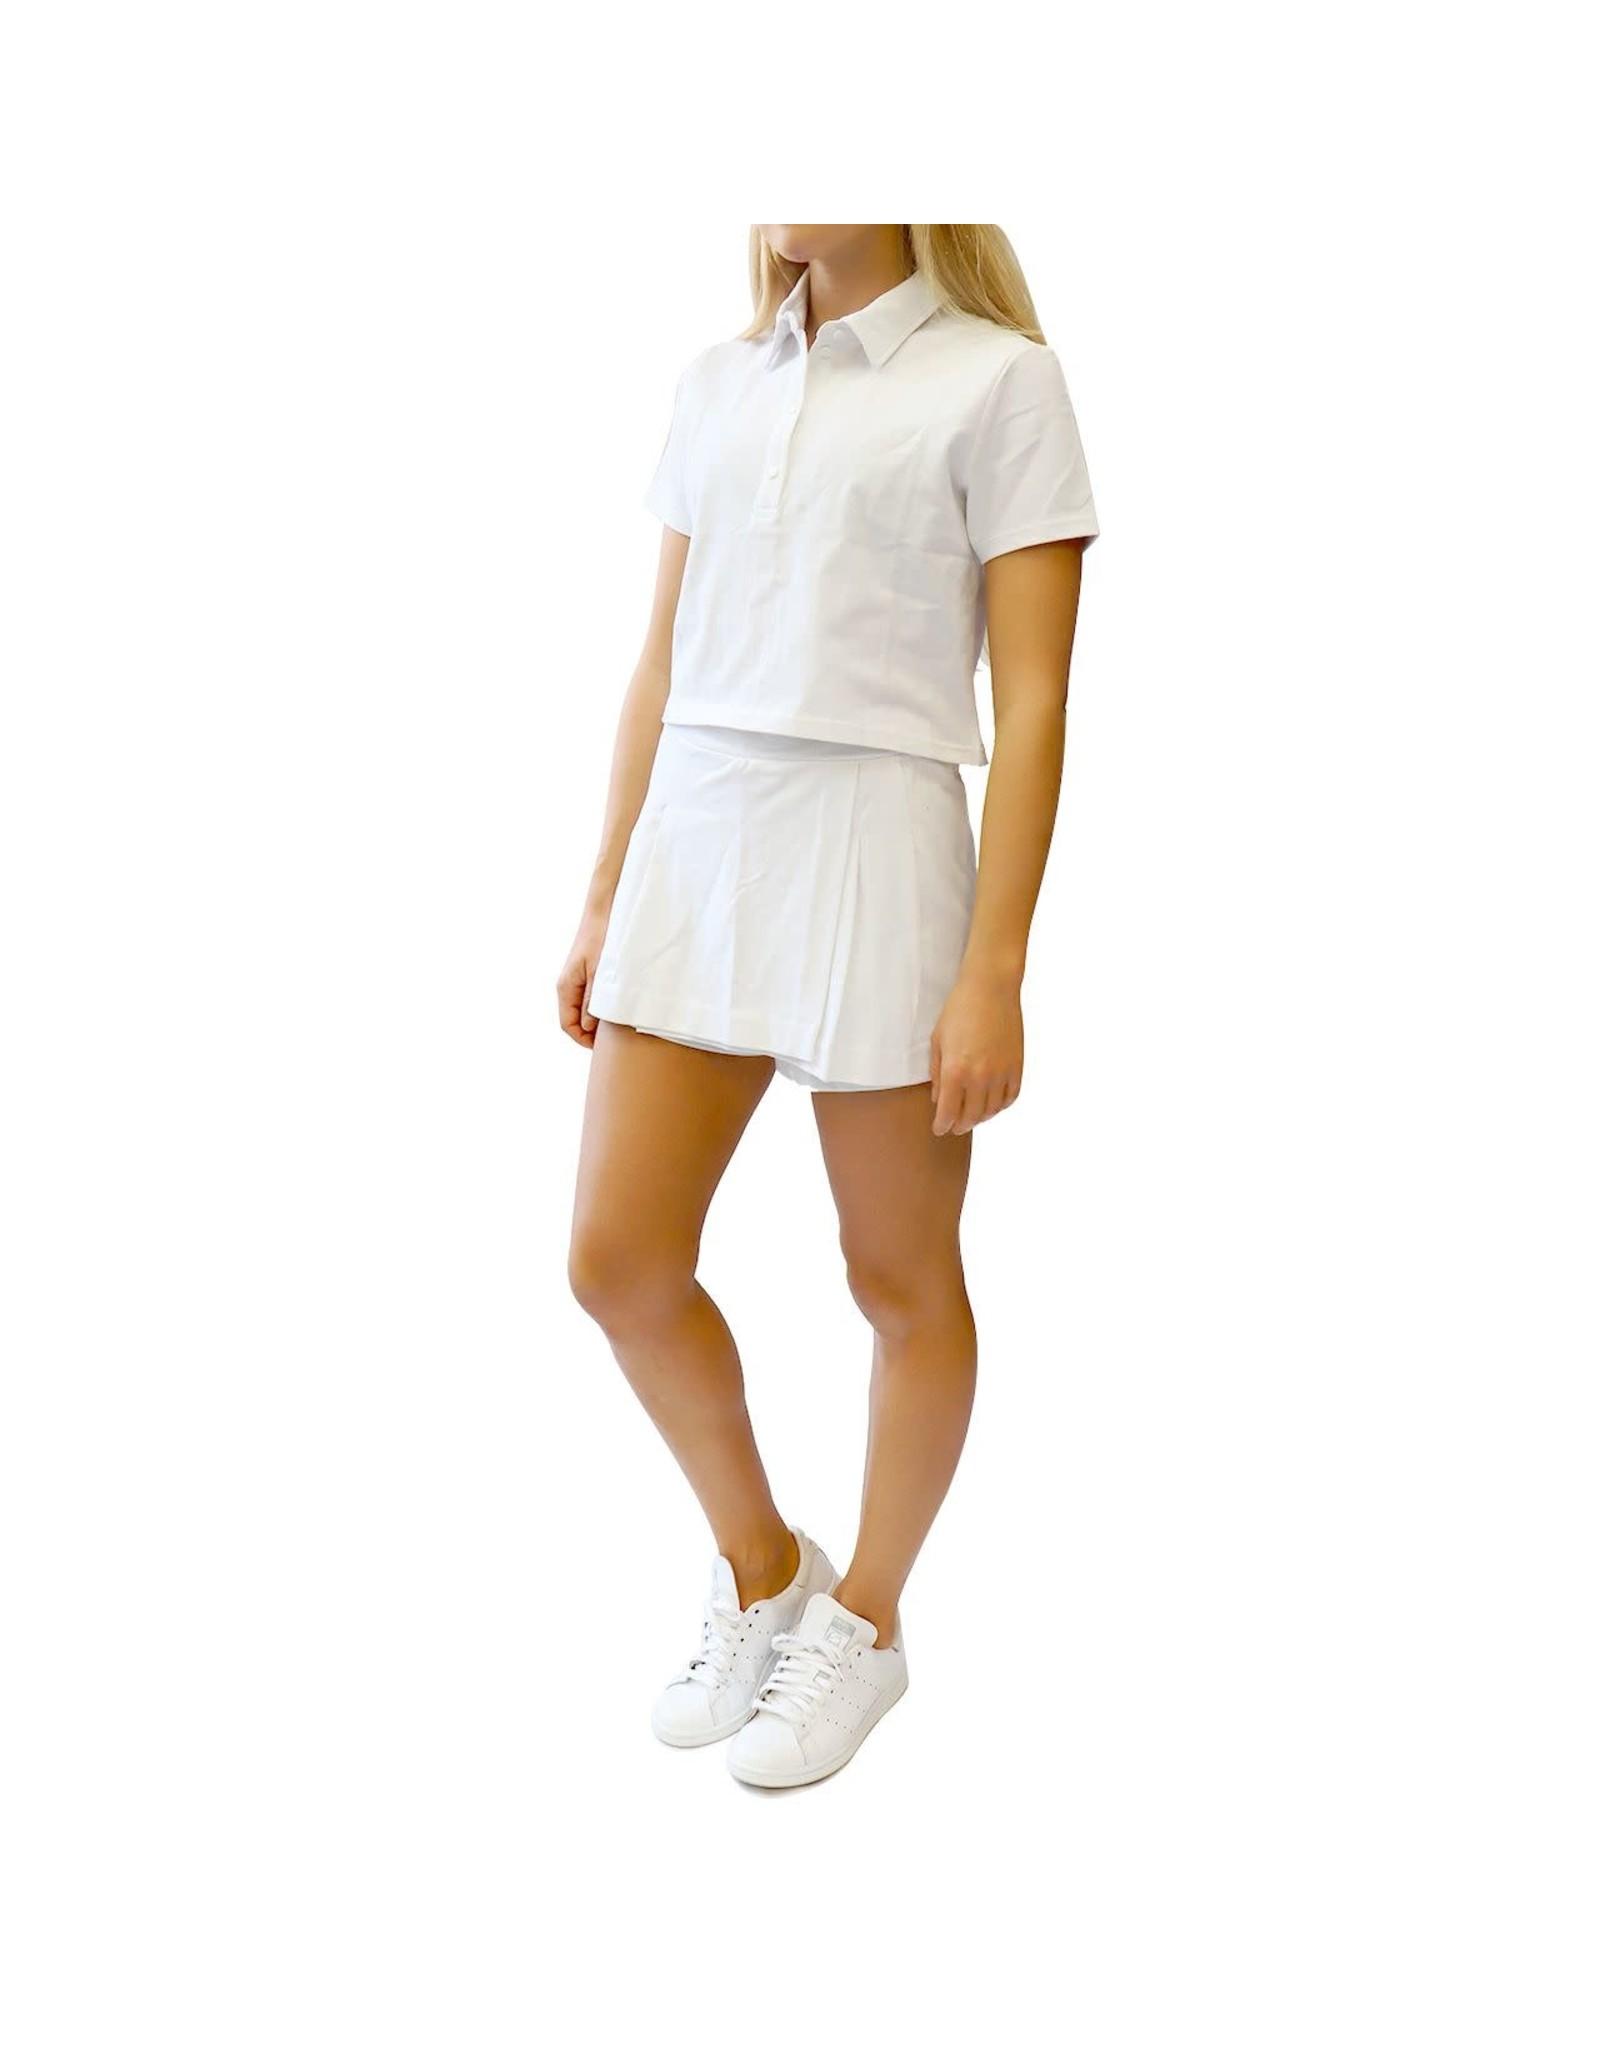 Bonanza - Tennis Top / White or Black